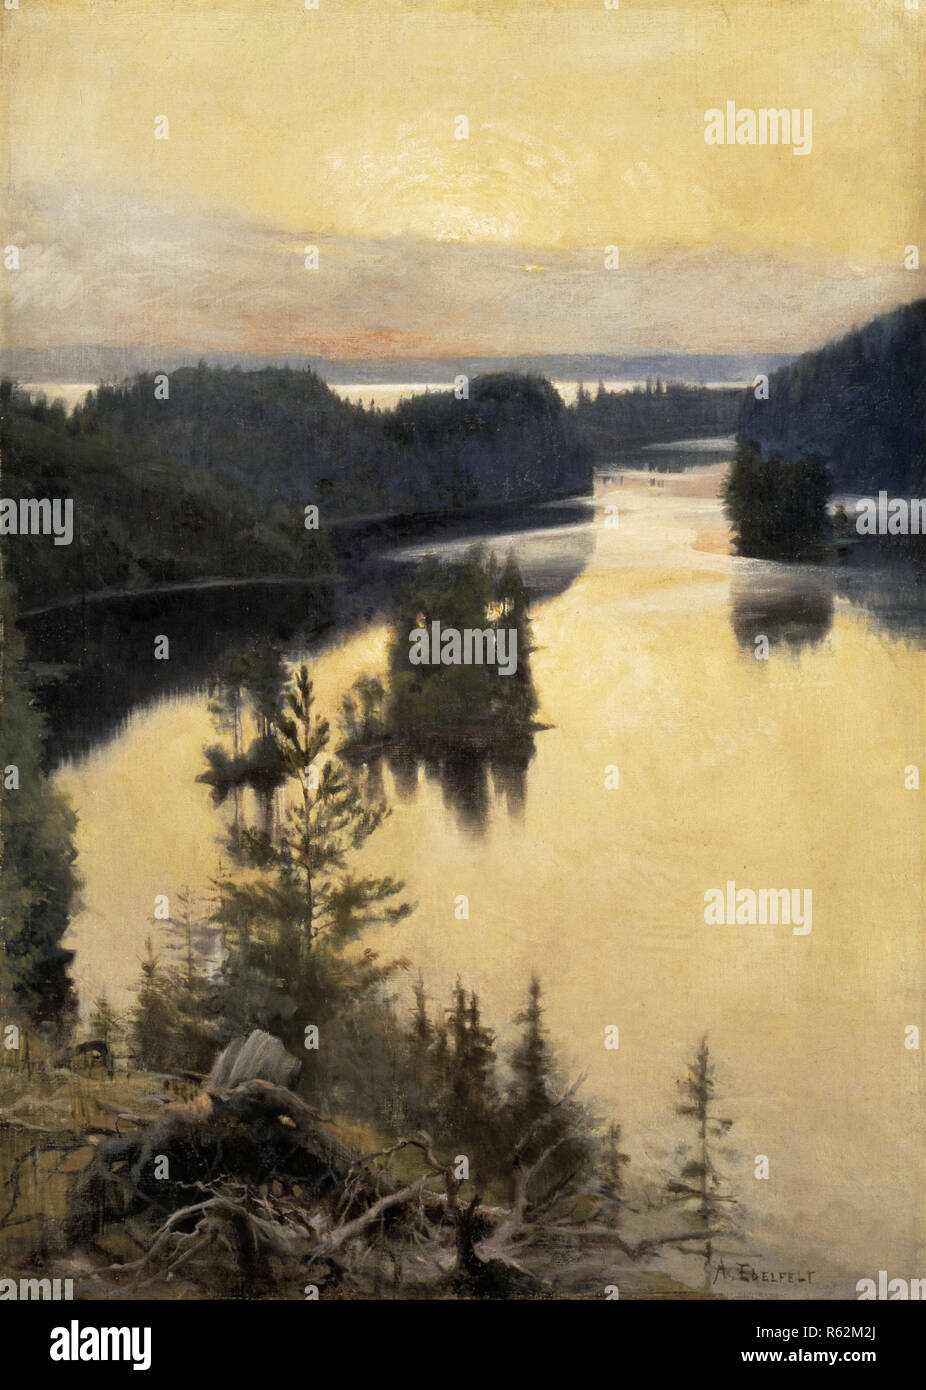 Kaukola Ridge at Sunset. Date/Period: 1889/1890. Painting. Oil on canvas. Width: 83 cm. Height: 116.5 cm (without frame). Author: Albert Edelfelt. Edelfelt, Albert Gustaf Aristides. Stock Photo